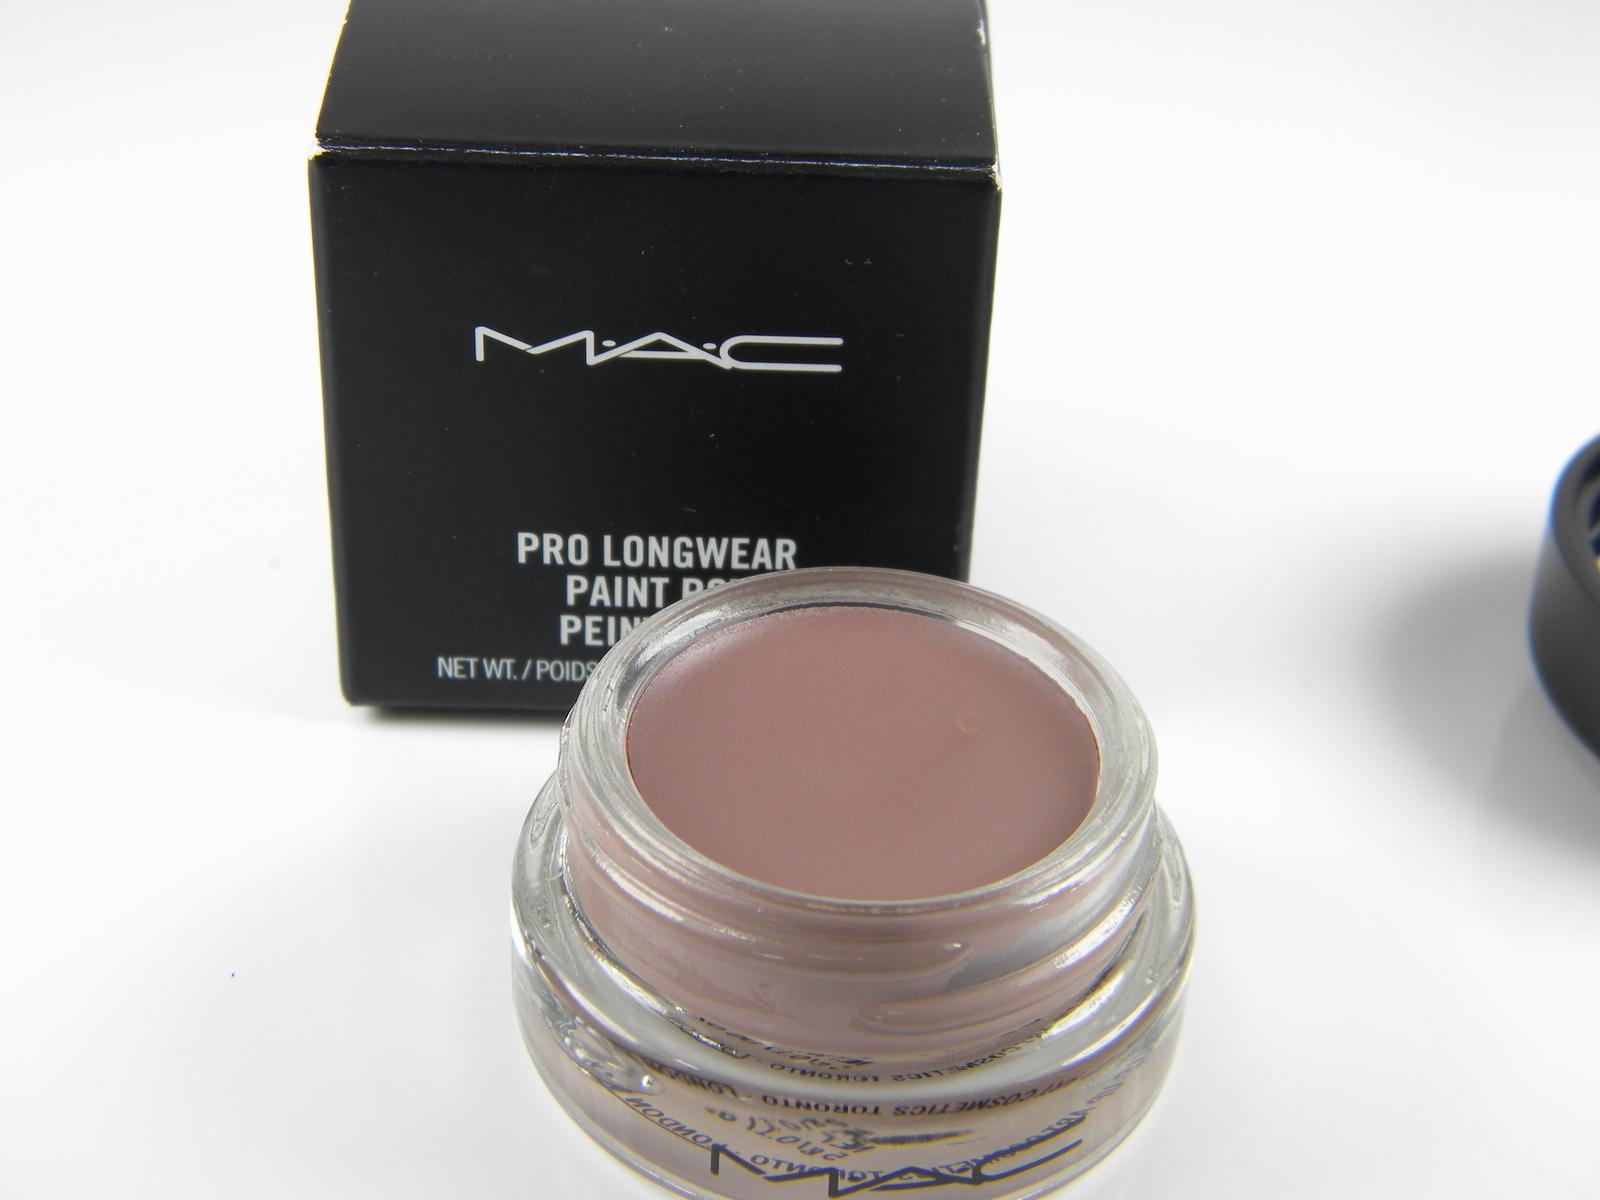 Mac paint pot pro longwear stormy pink 5g 17oz boxed for Mac pro longwear paint pot painterly